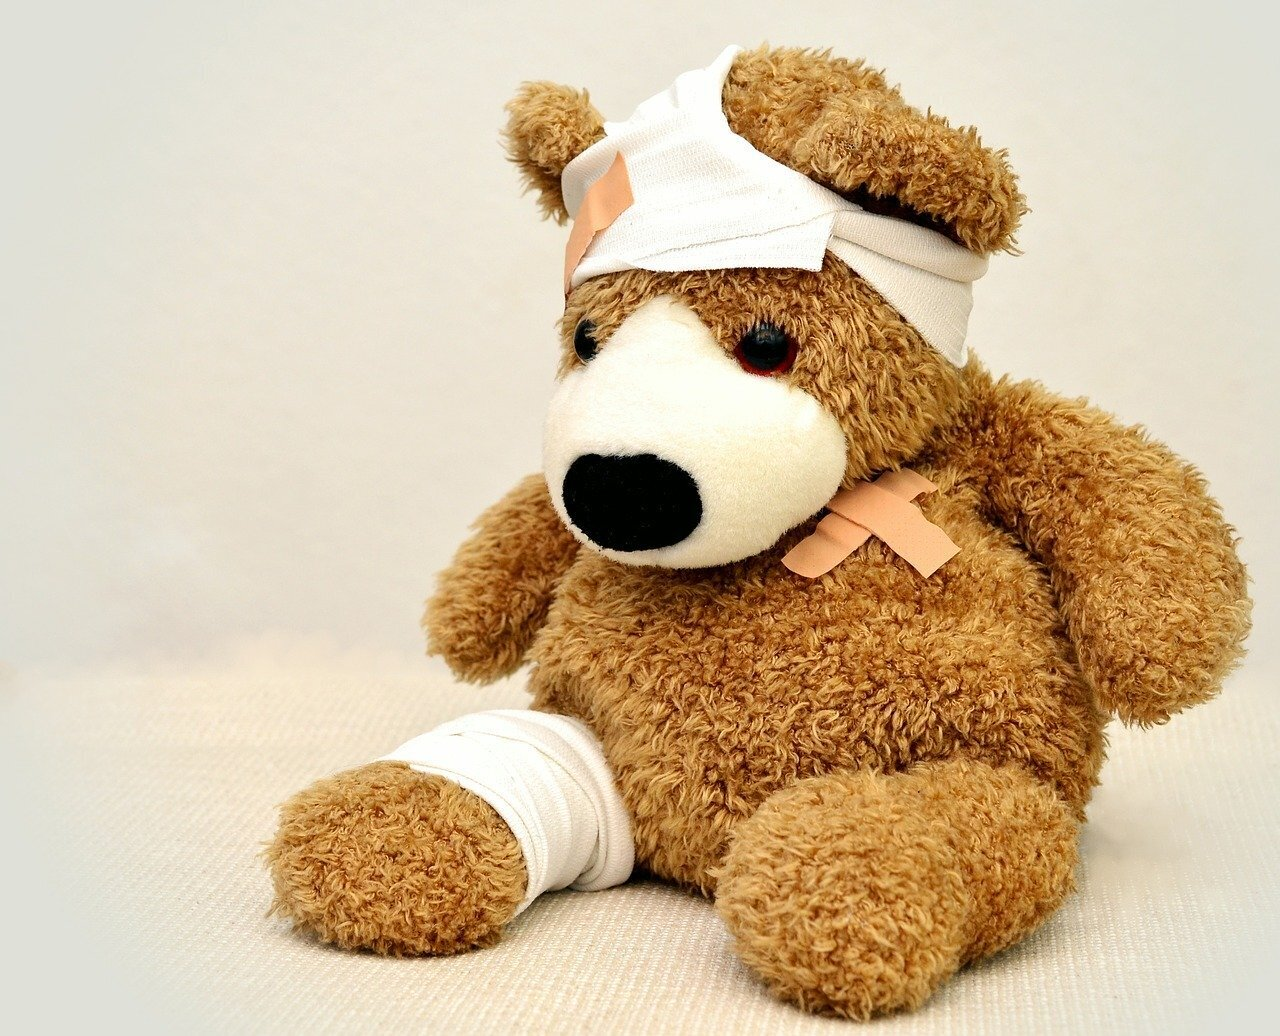 Teddy ist krank